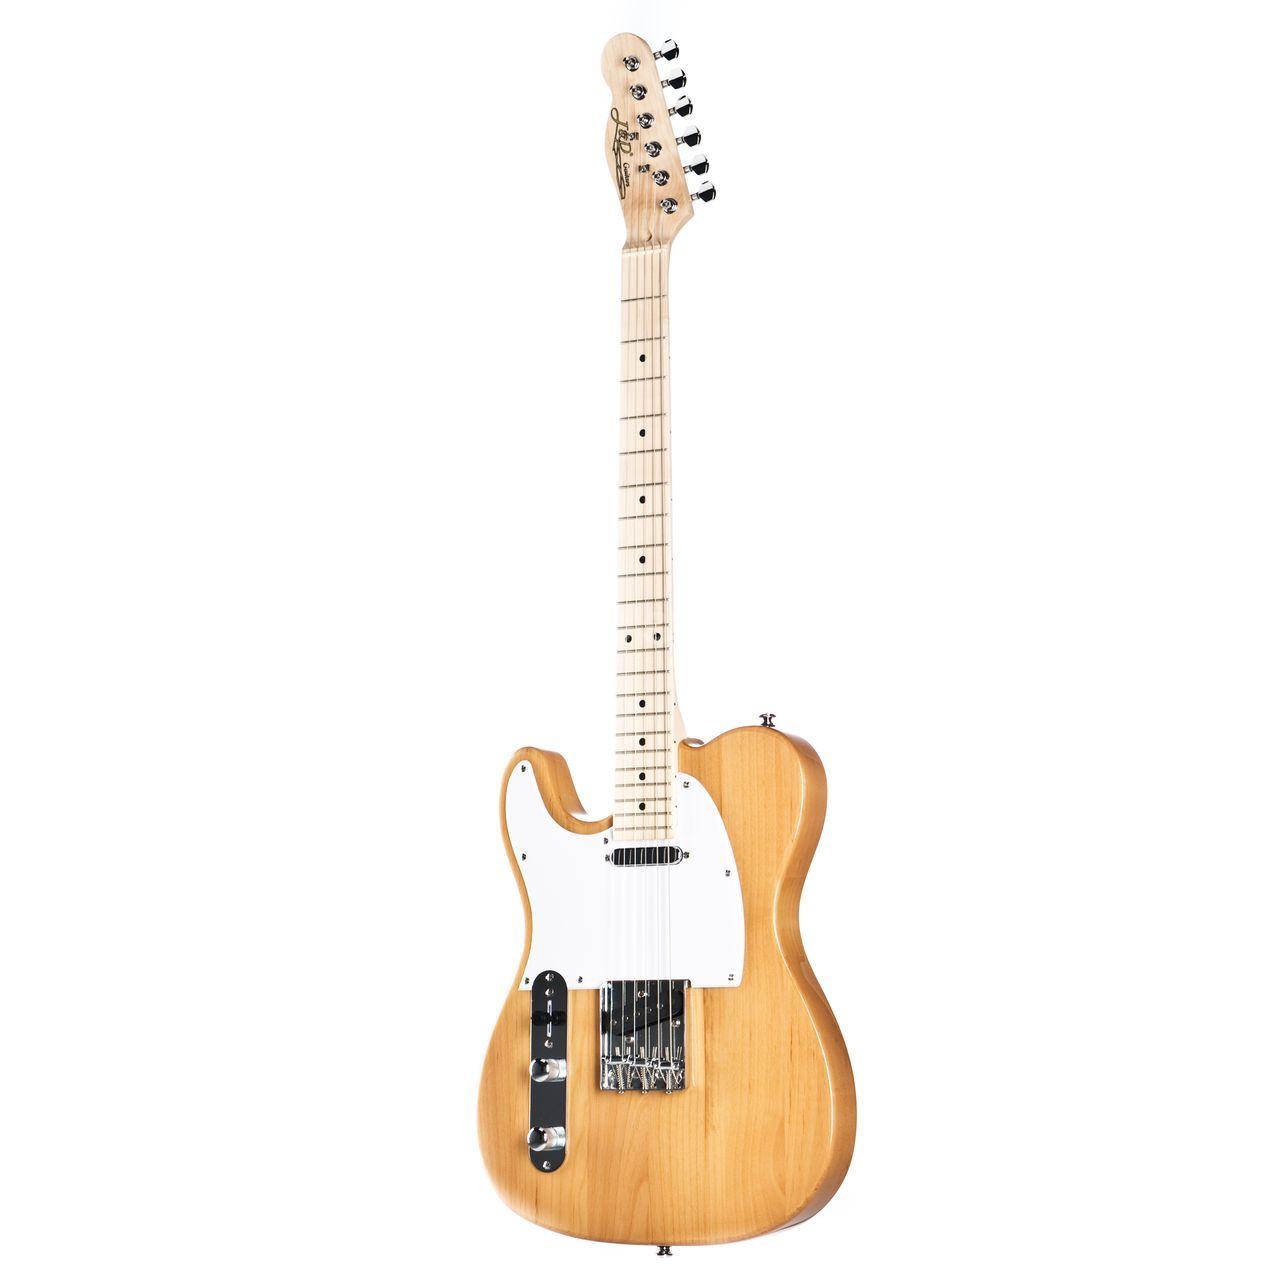 jack danny e gitarre tl lefthand natural music store professional. Black Bedroom Furniture Sets. Home Design Ideas